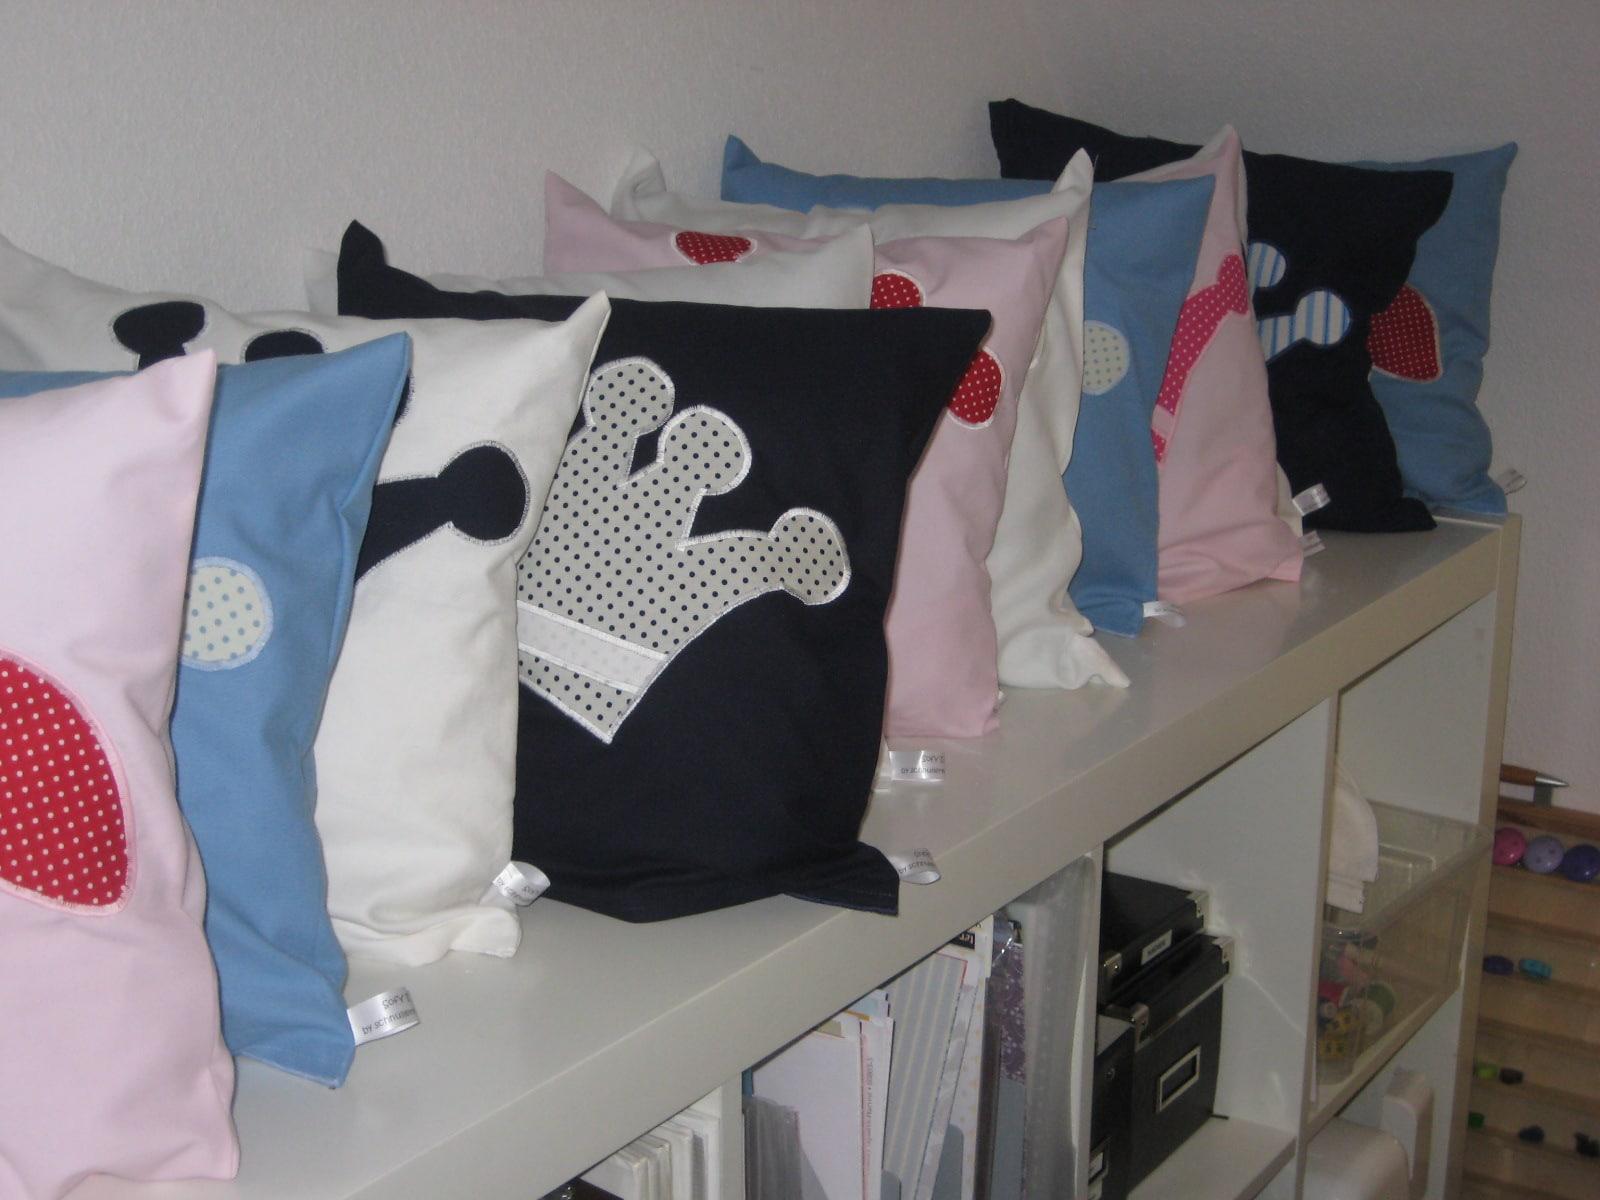 kissenbez ge mit appliaktion und wunschnamen handmade kultur. Black Bedroom Furniture Sets. Home Design Ideas